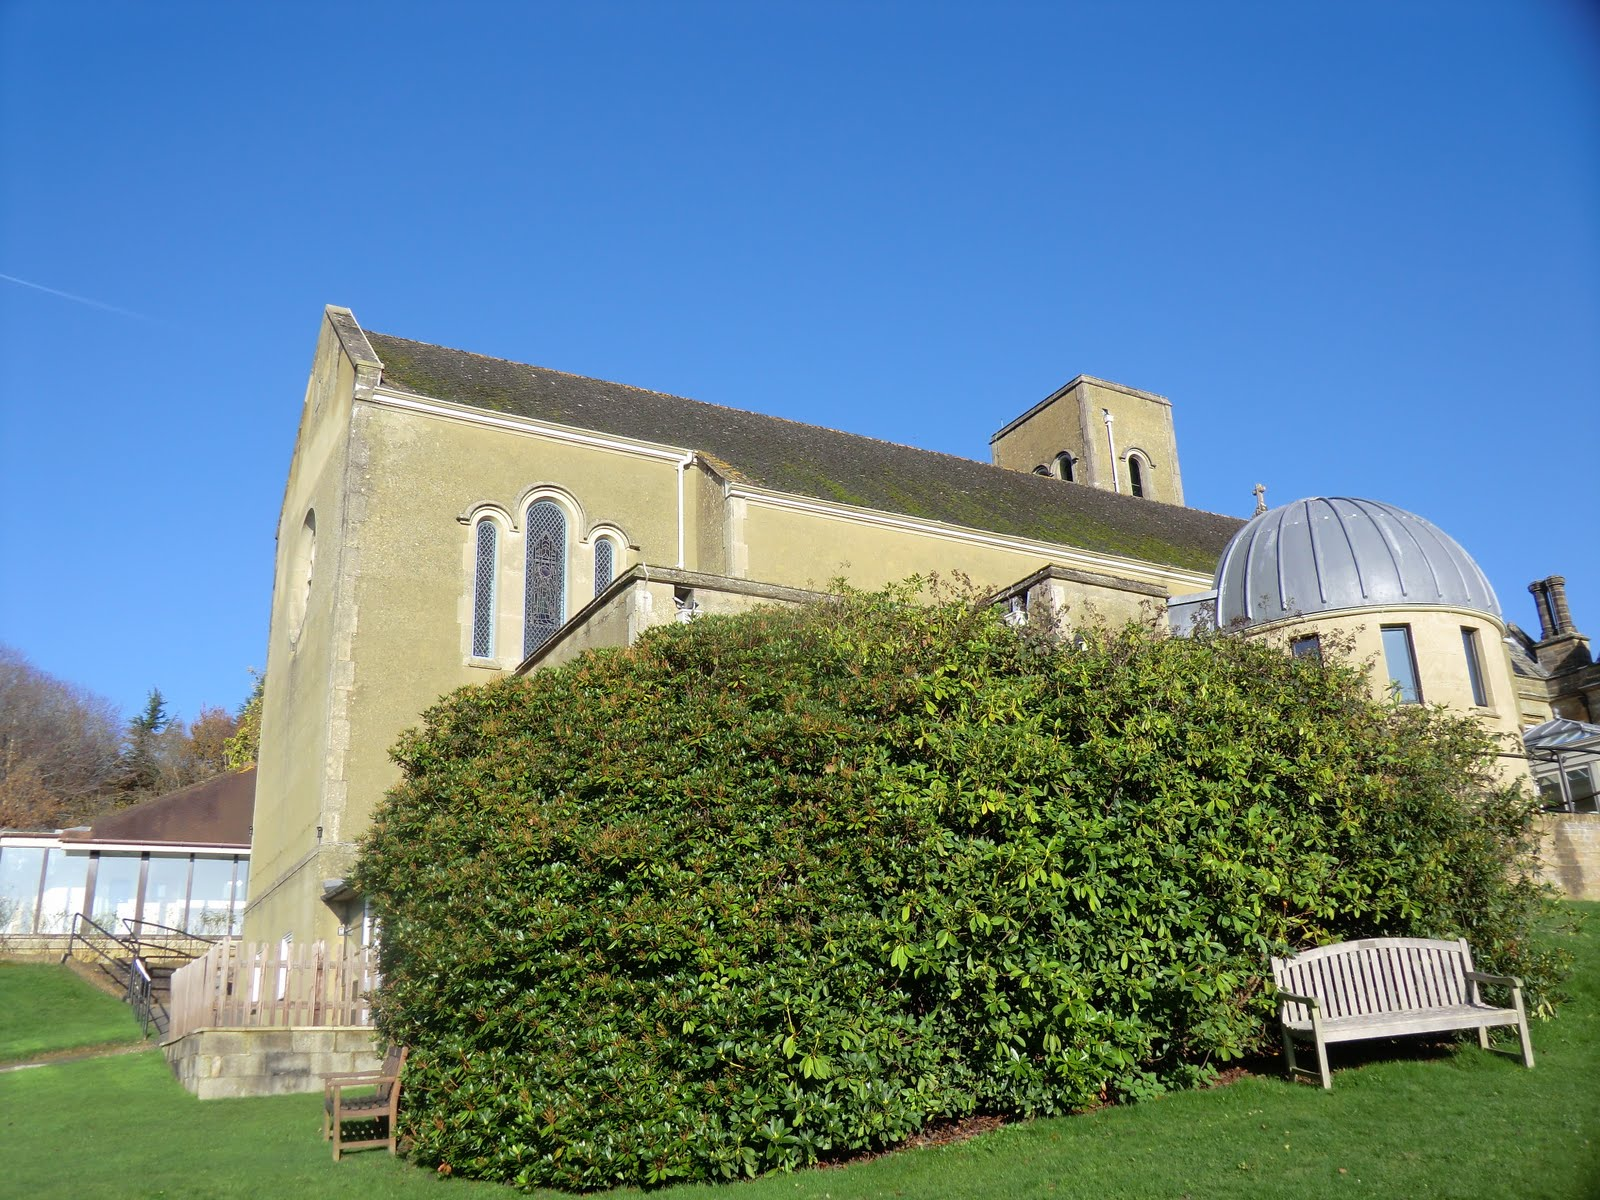 CIMG6234 Burrswood church